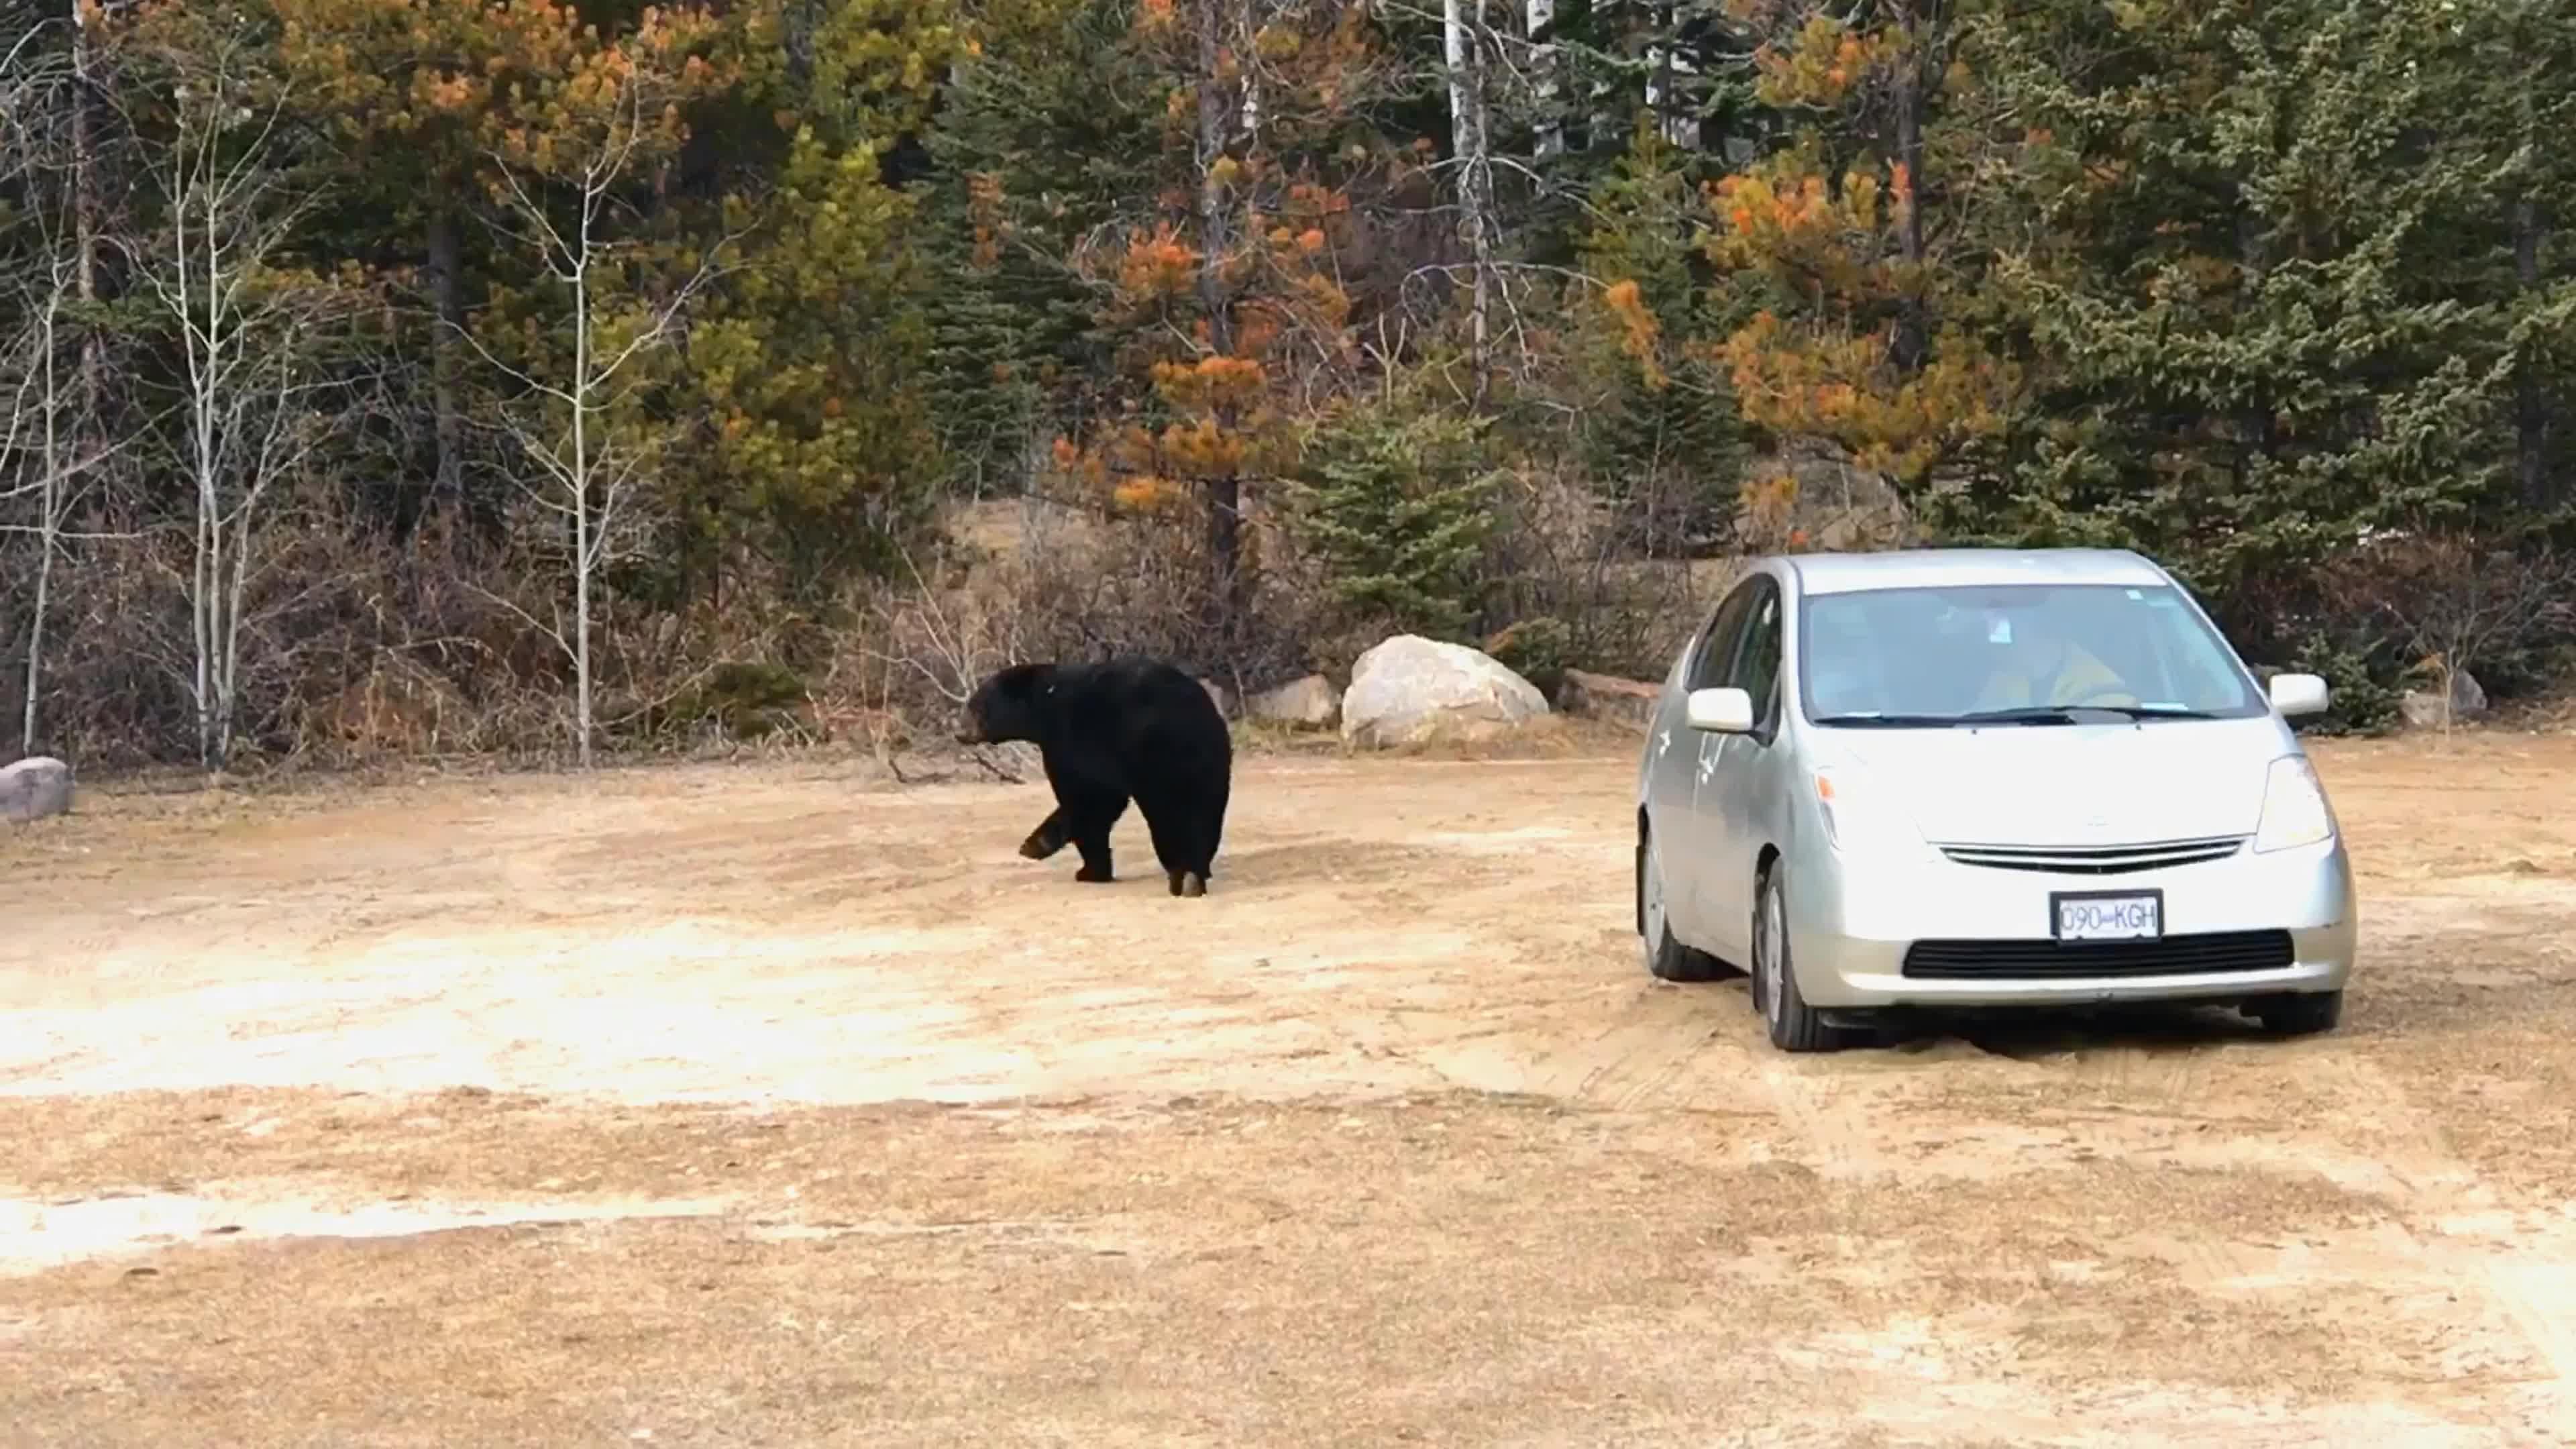 Bear Pays Car a Visit in Banff National Park